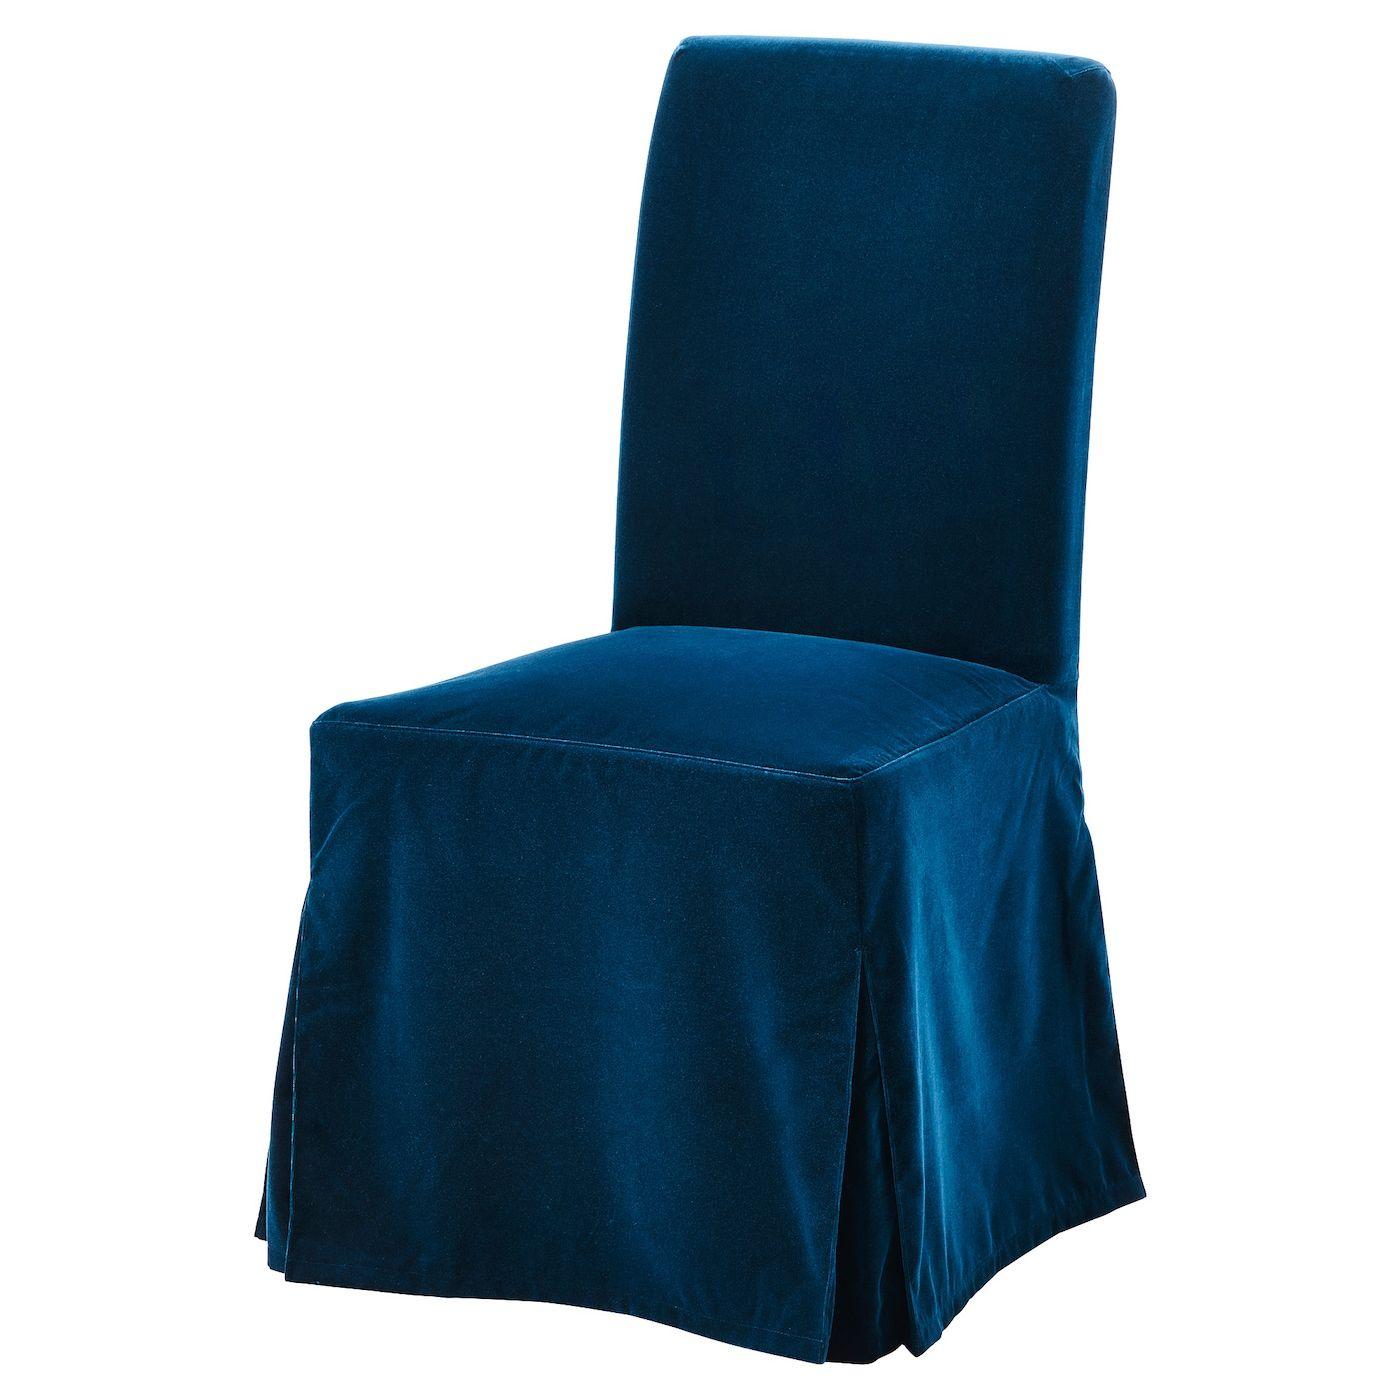 Henriksdal Chair Cover Long Djuparp Dark Green Blue Ikea Henriksdal Chair Cover Chair Cover Velvet Slipcovers